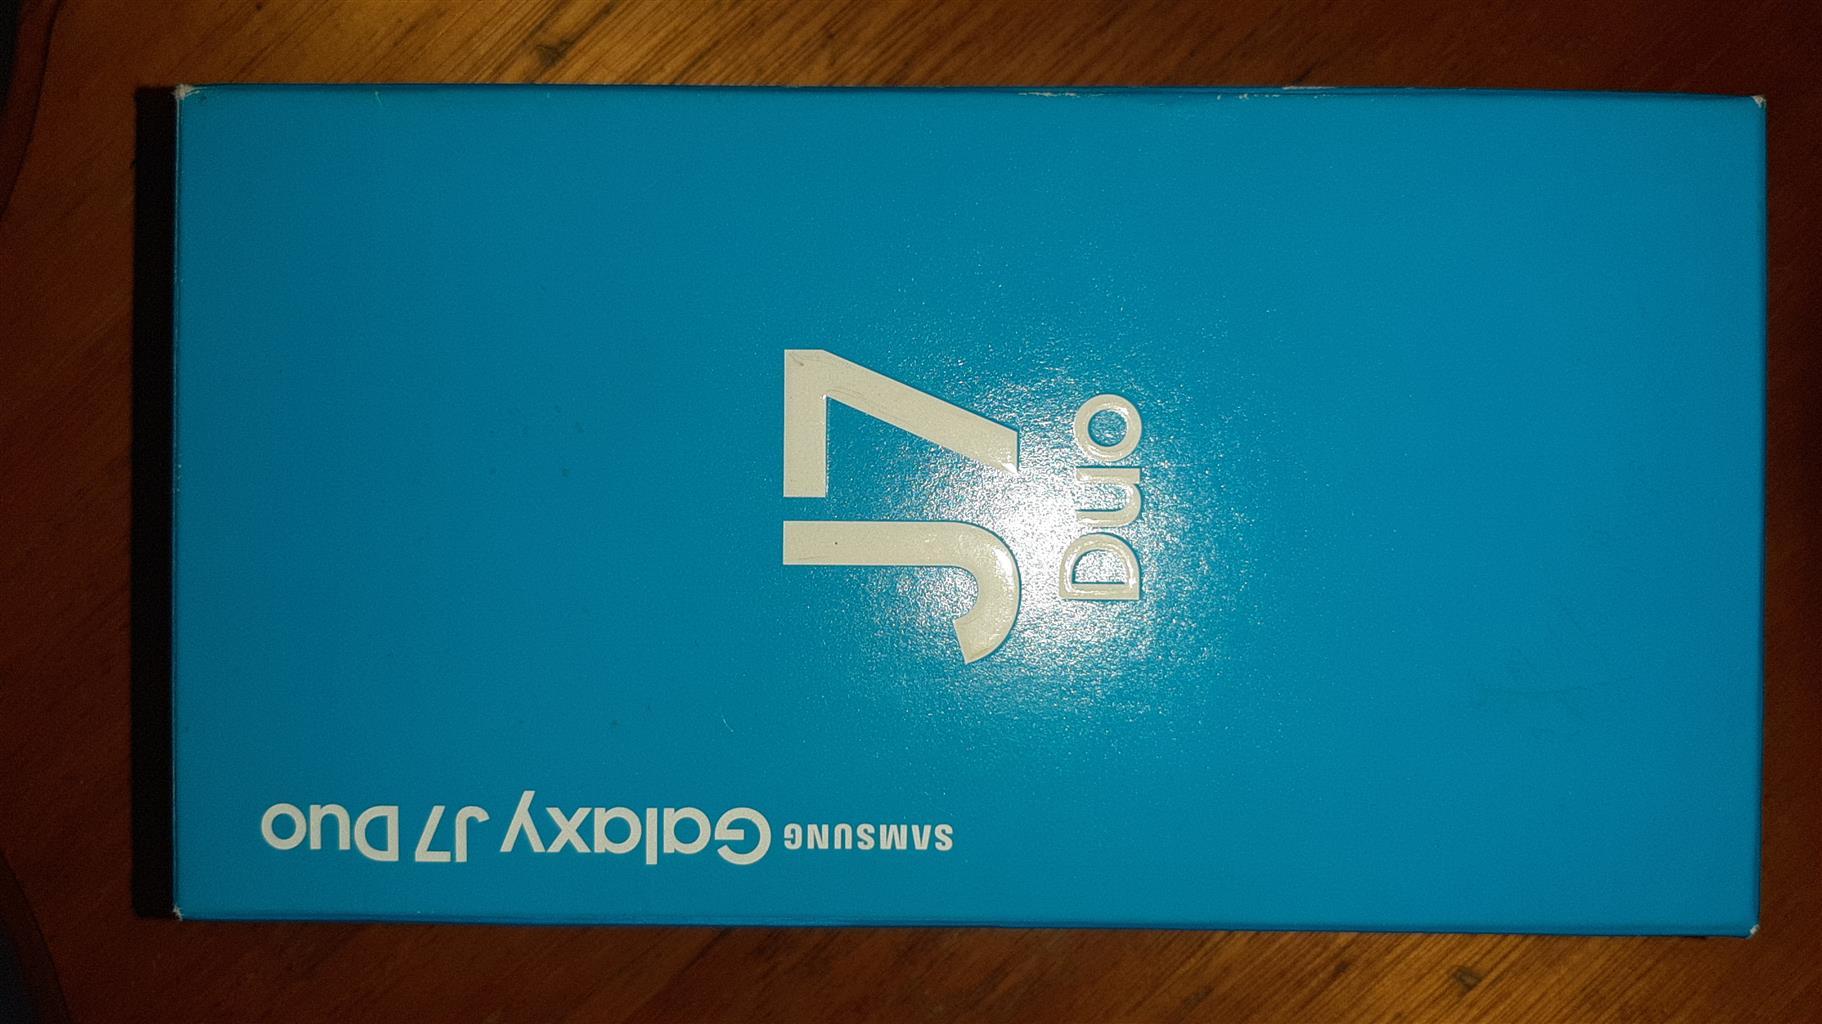 Samsung J7 Duo, Excellent Condition